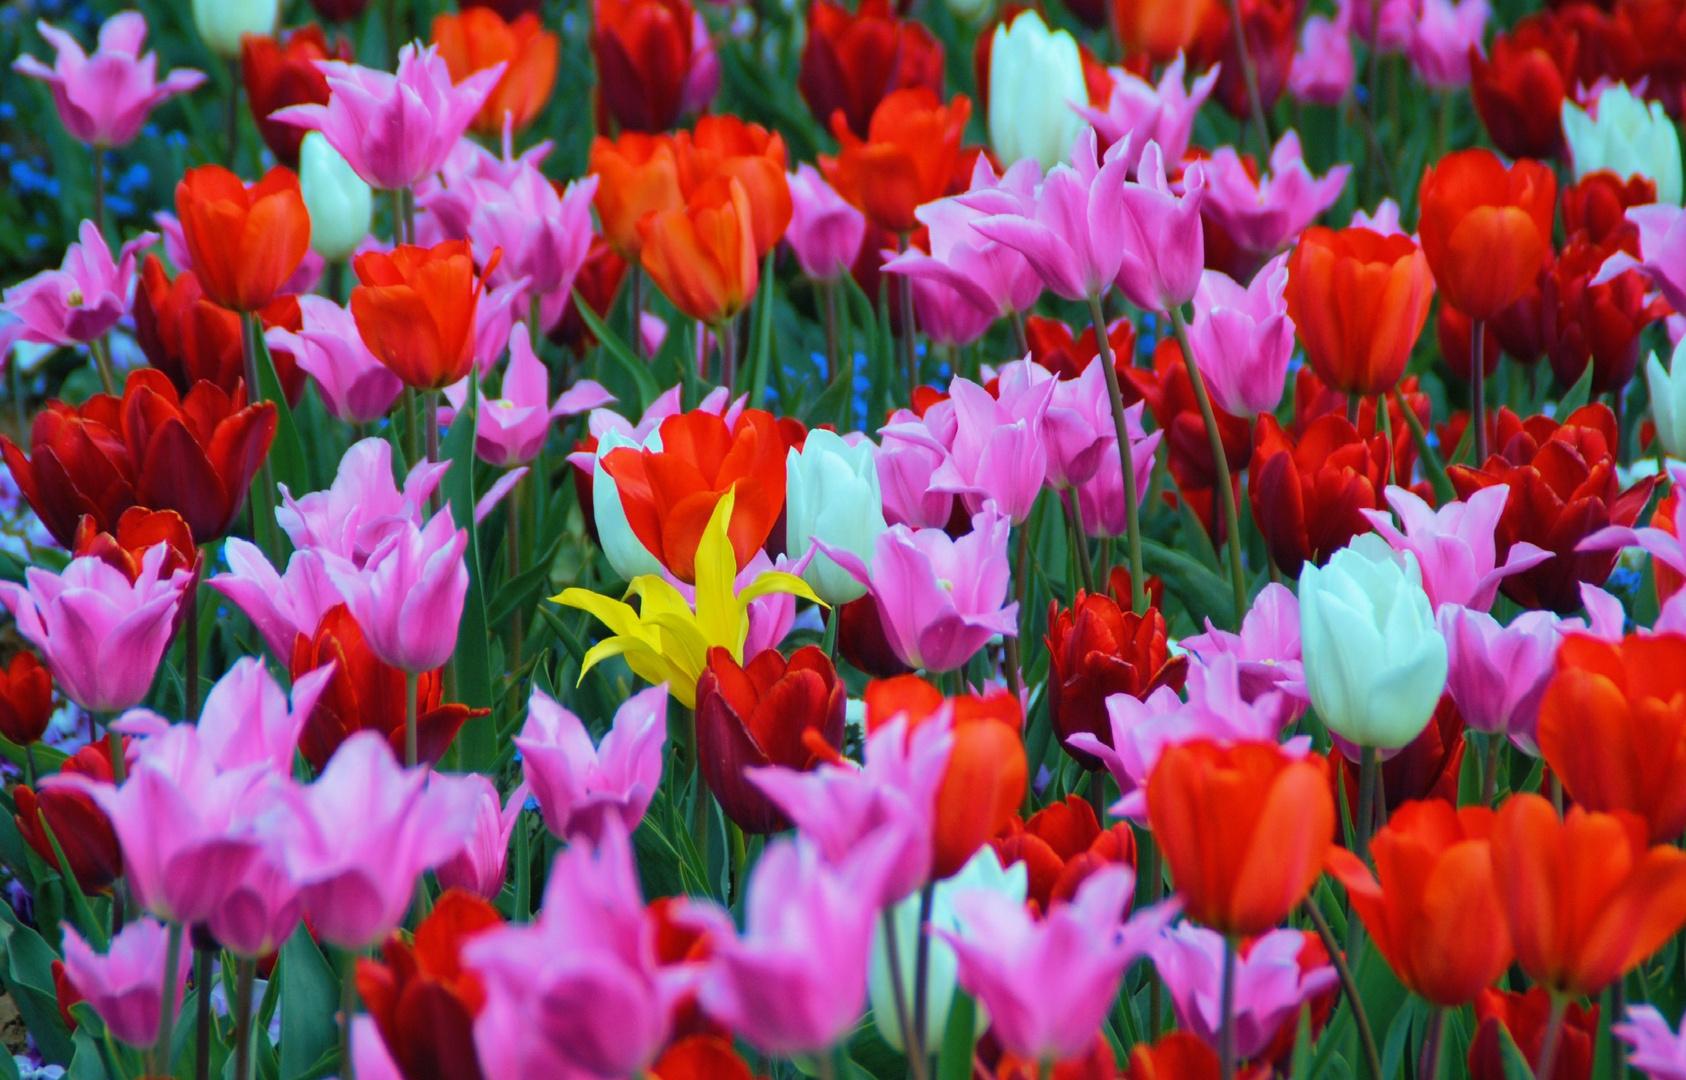 Ein Mittwochsblümchen unter vielen Mo,Di,Do,Fr,Sa+So-Blumen V